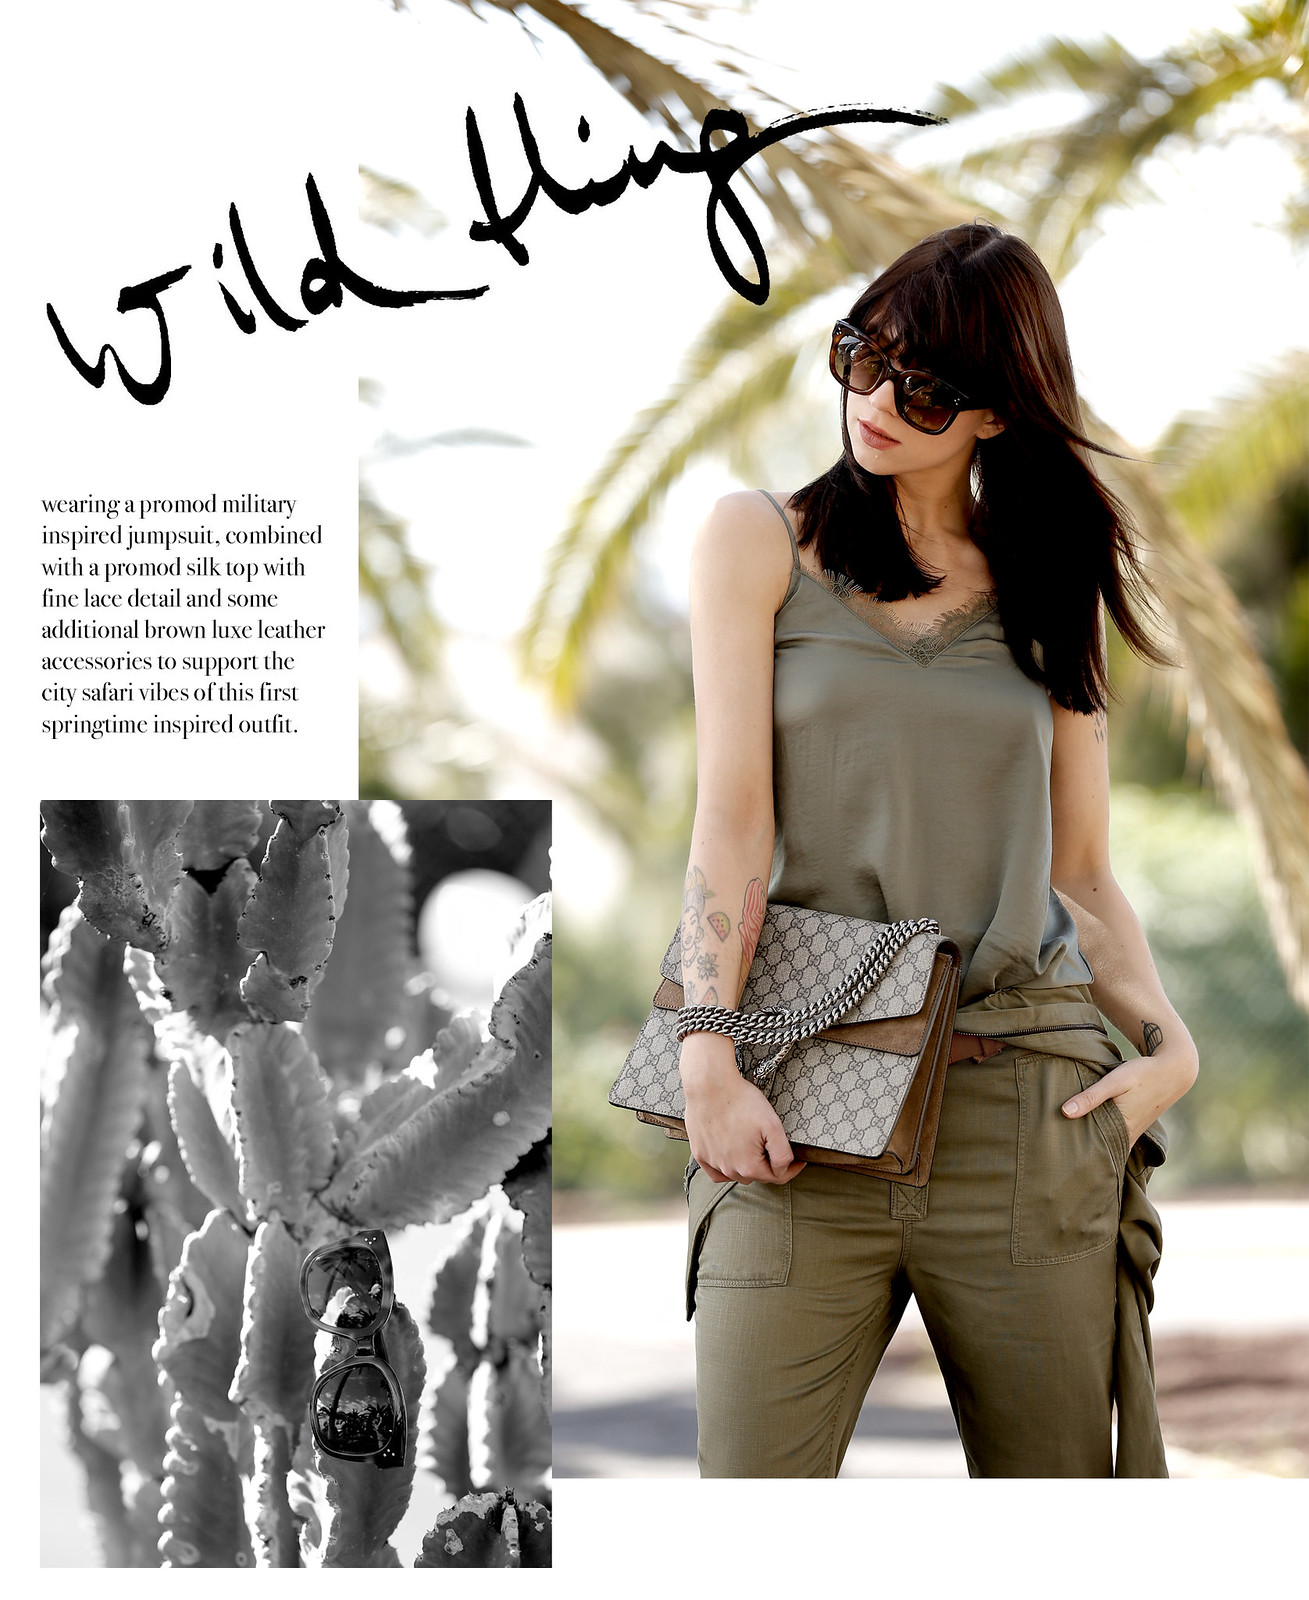 promod african safari jumpsuit khaki outfit ootd blogger modeblogger gucci dionysus céline audrey summer palms travelblogger cats & dogs ricarda schernus düsseldorf blog 7